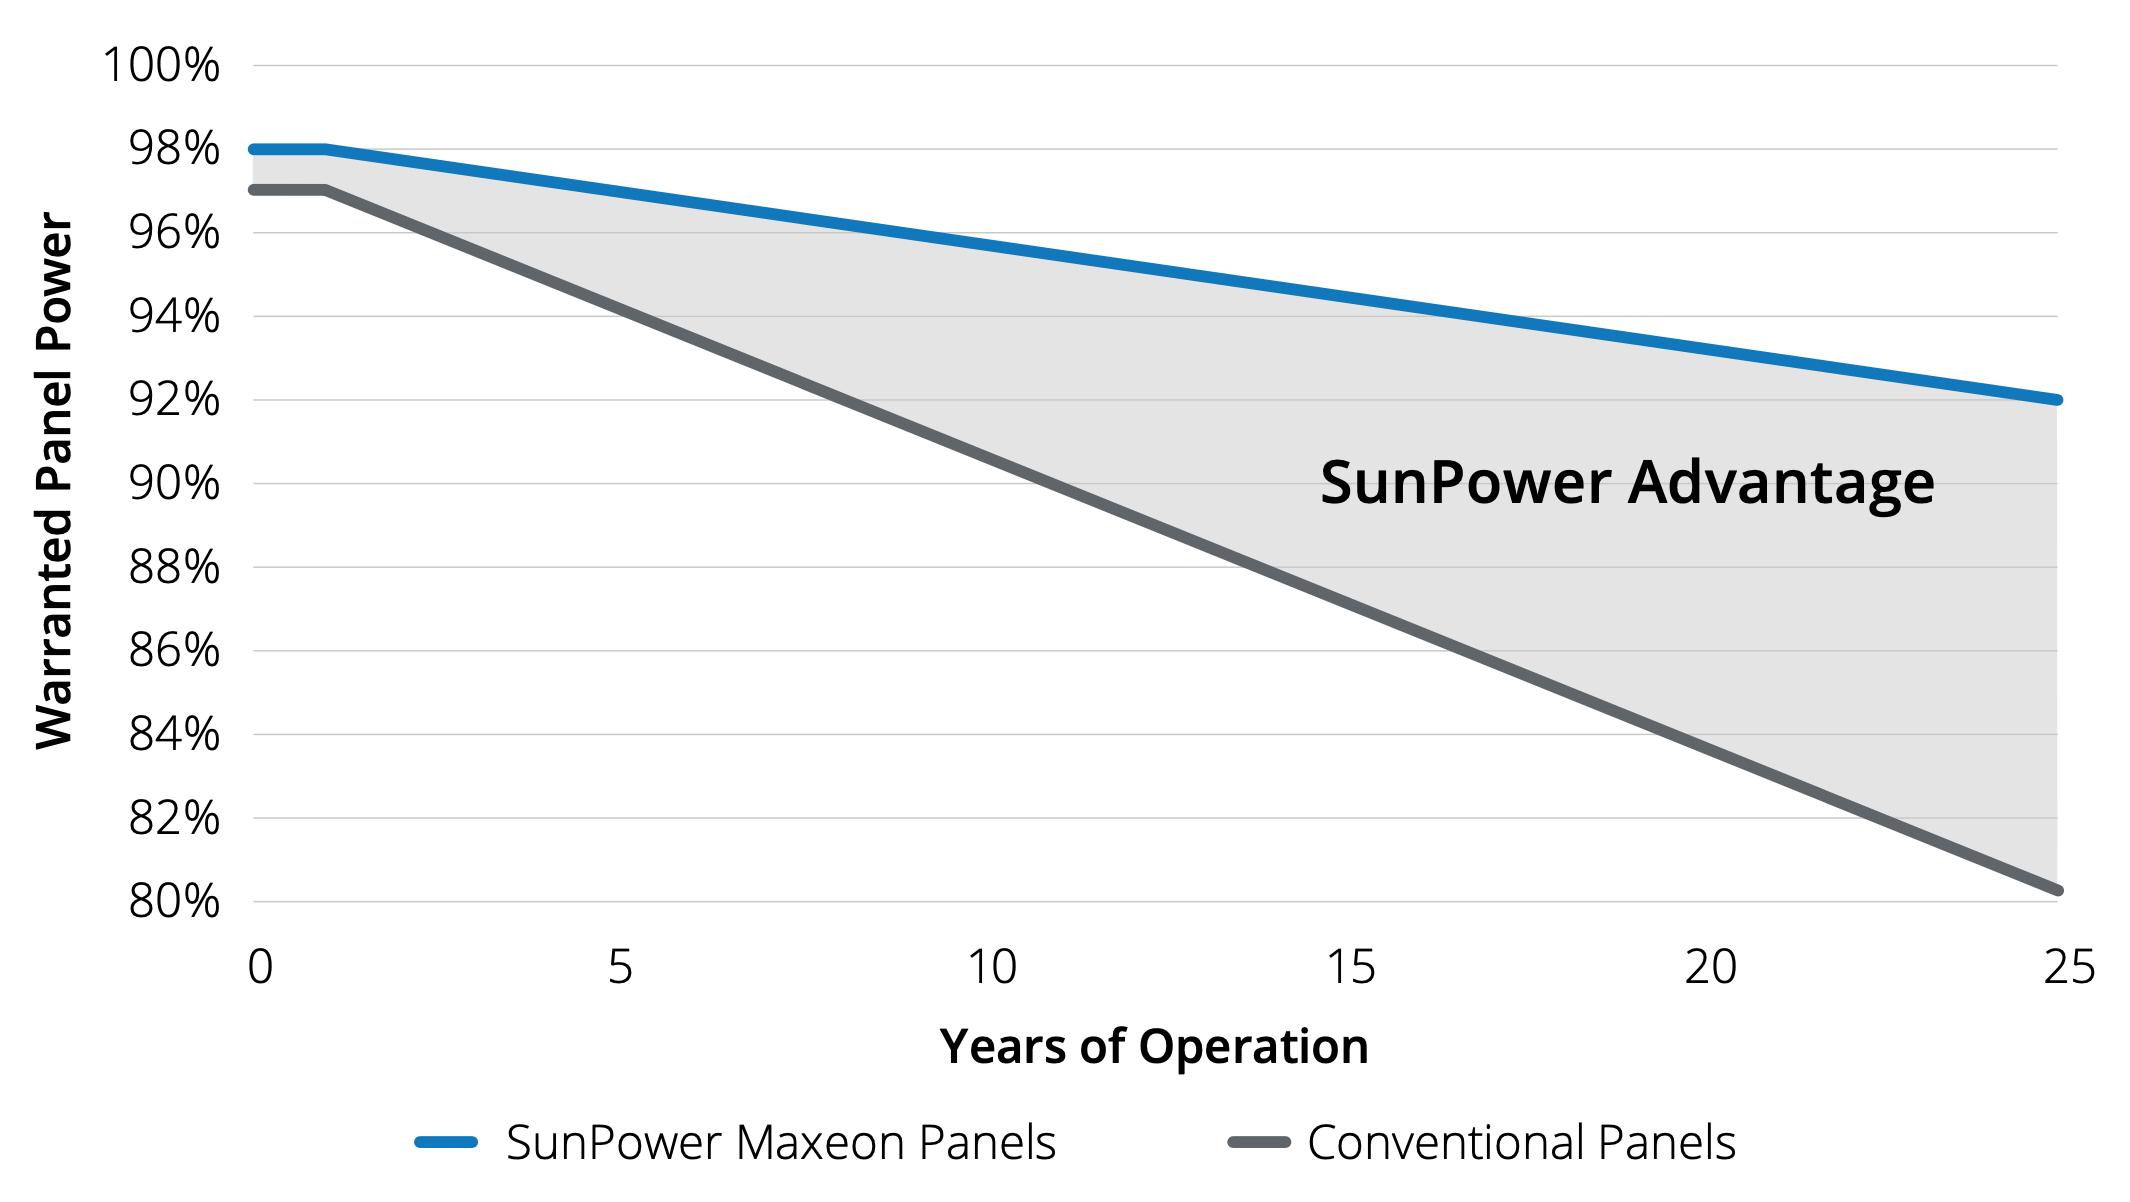 SunPower warranty advantage